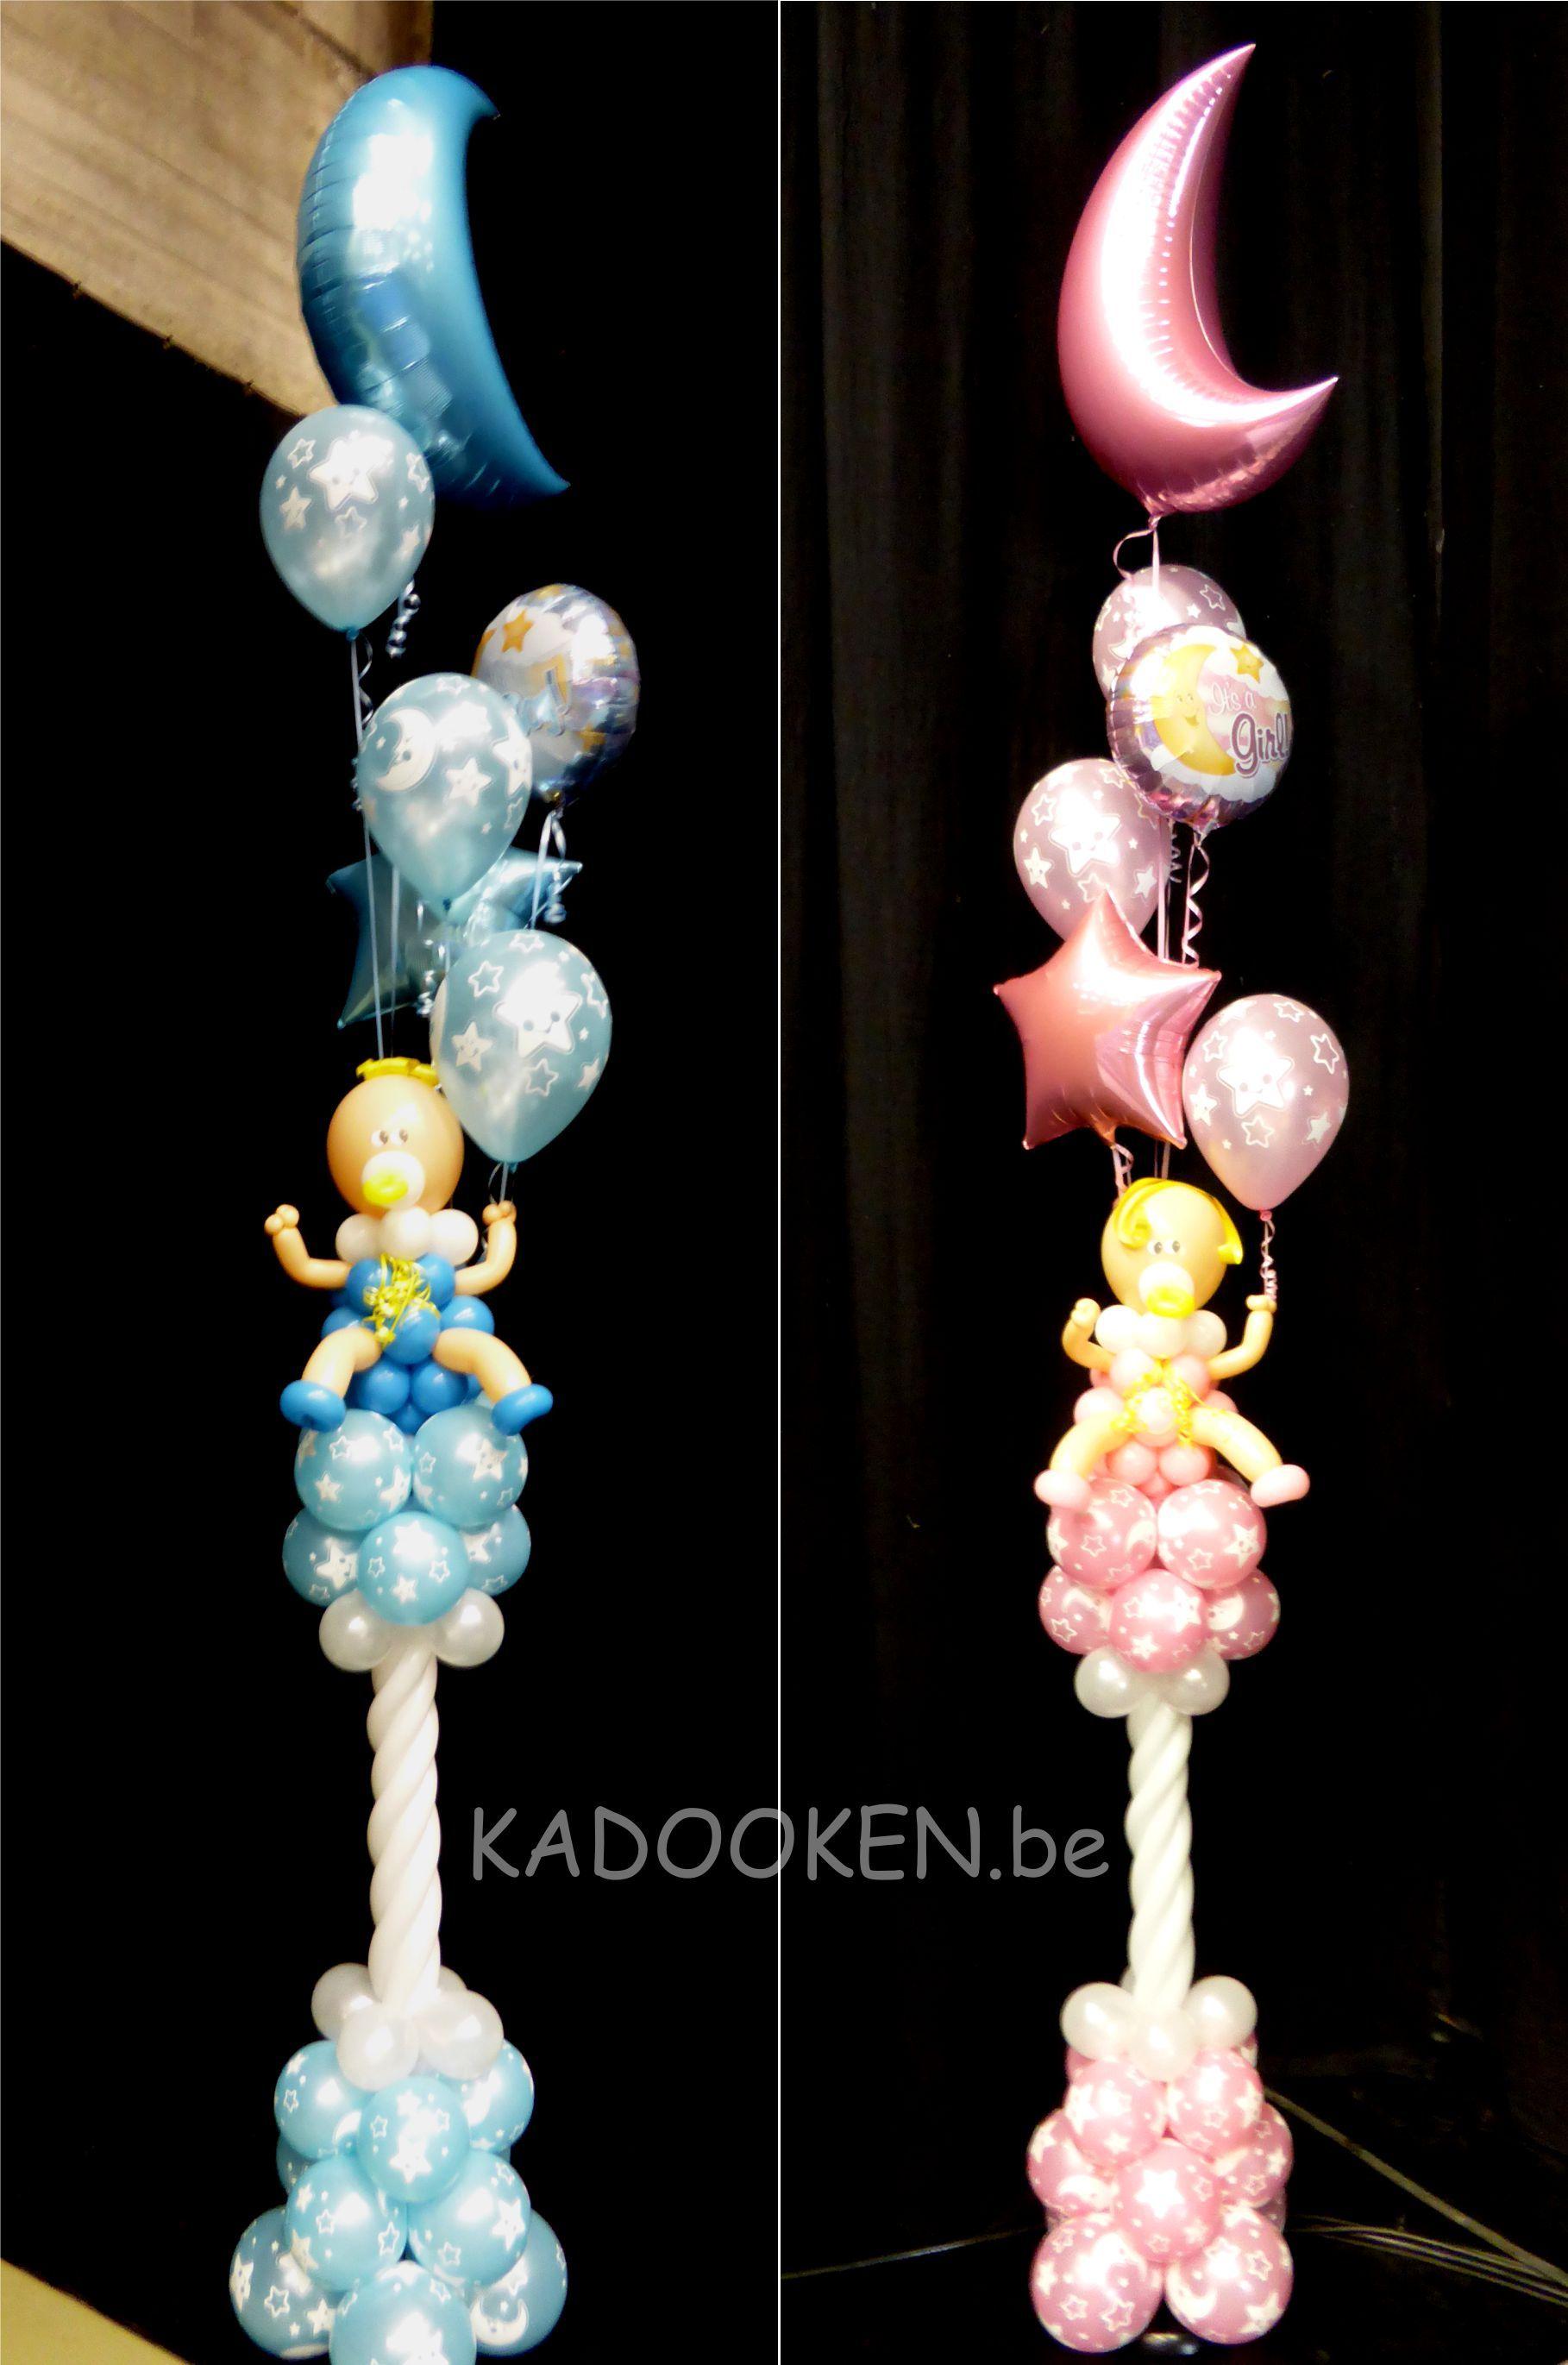 Ballonnen, Ballondecoratie, ballonbaby's, ballons geboorte, ballonshop, heliumballonnen, aankleding babyborrel www.kadooken.be